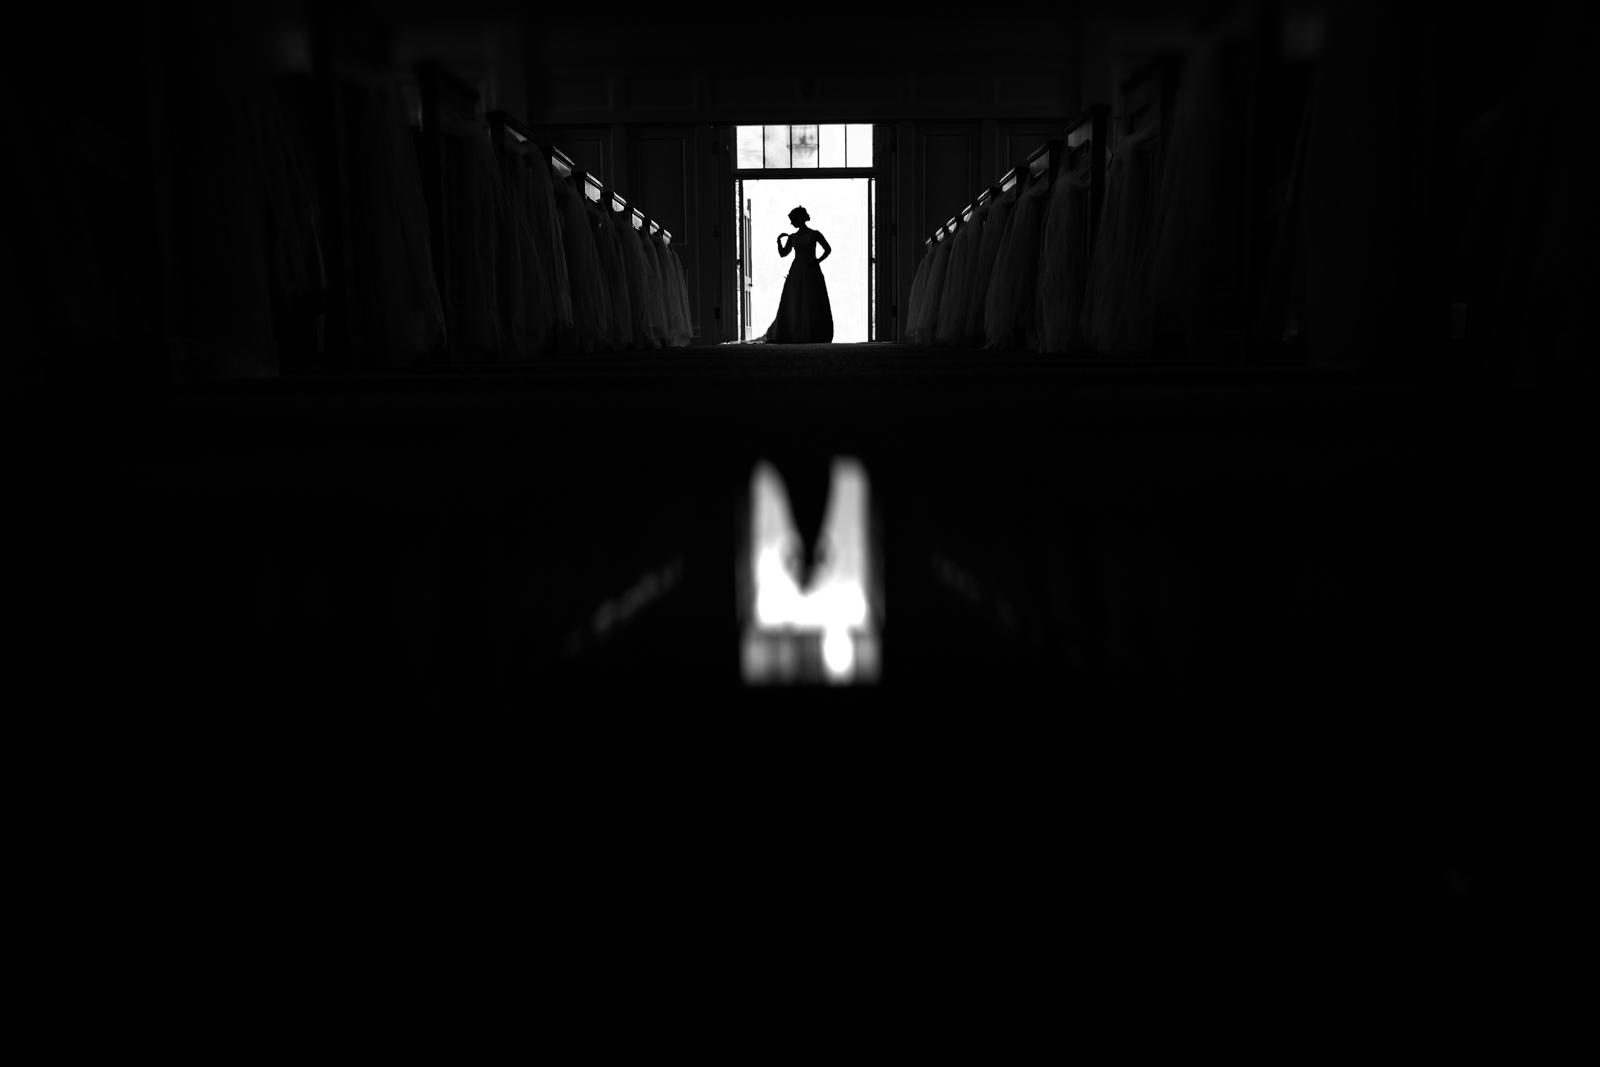 naperville-wedding-photography-47.jpg